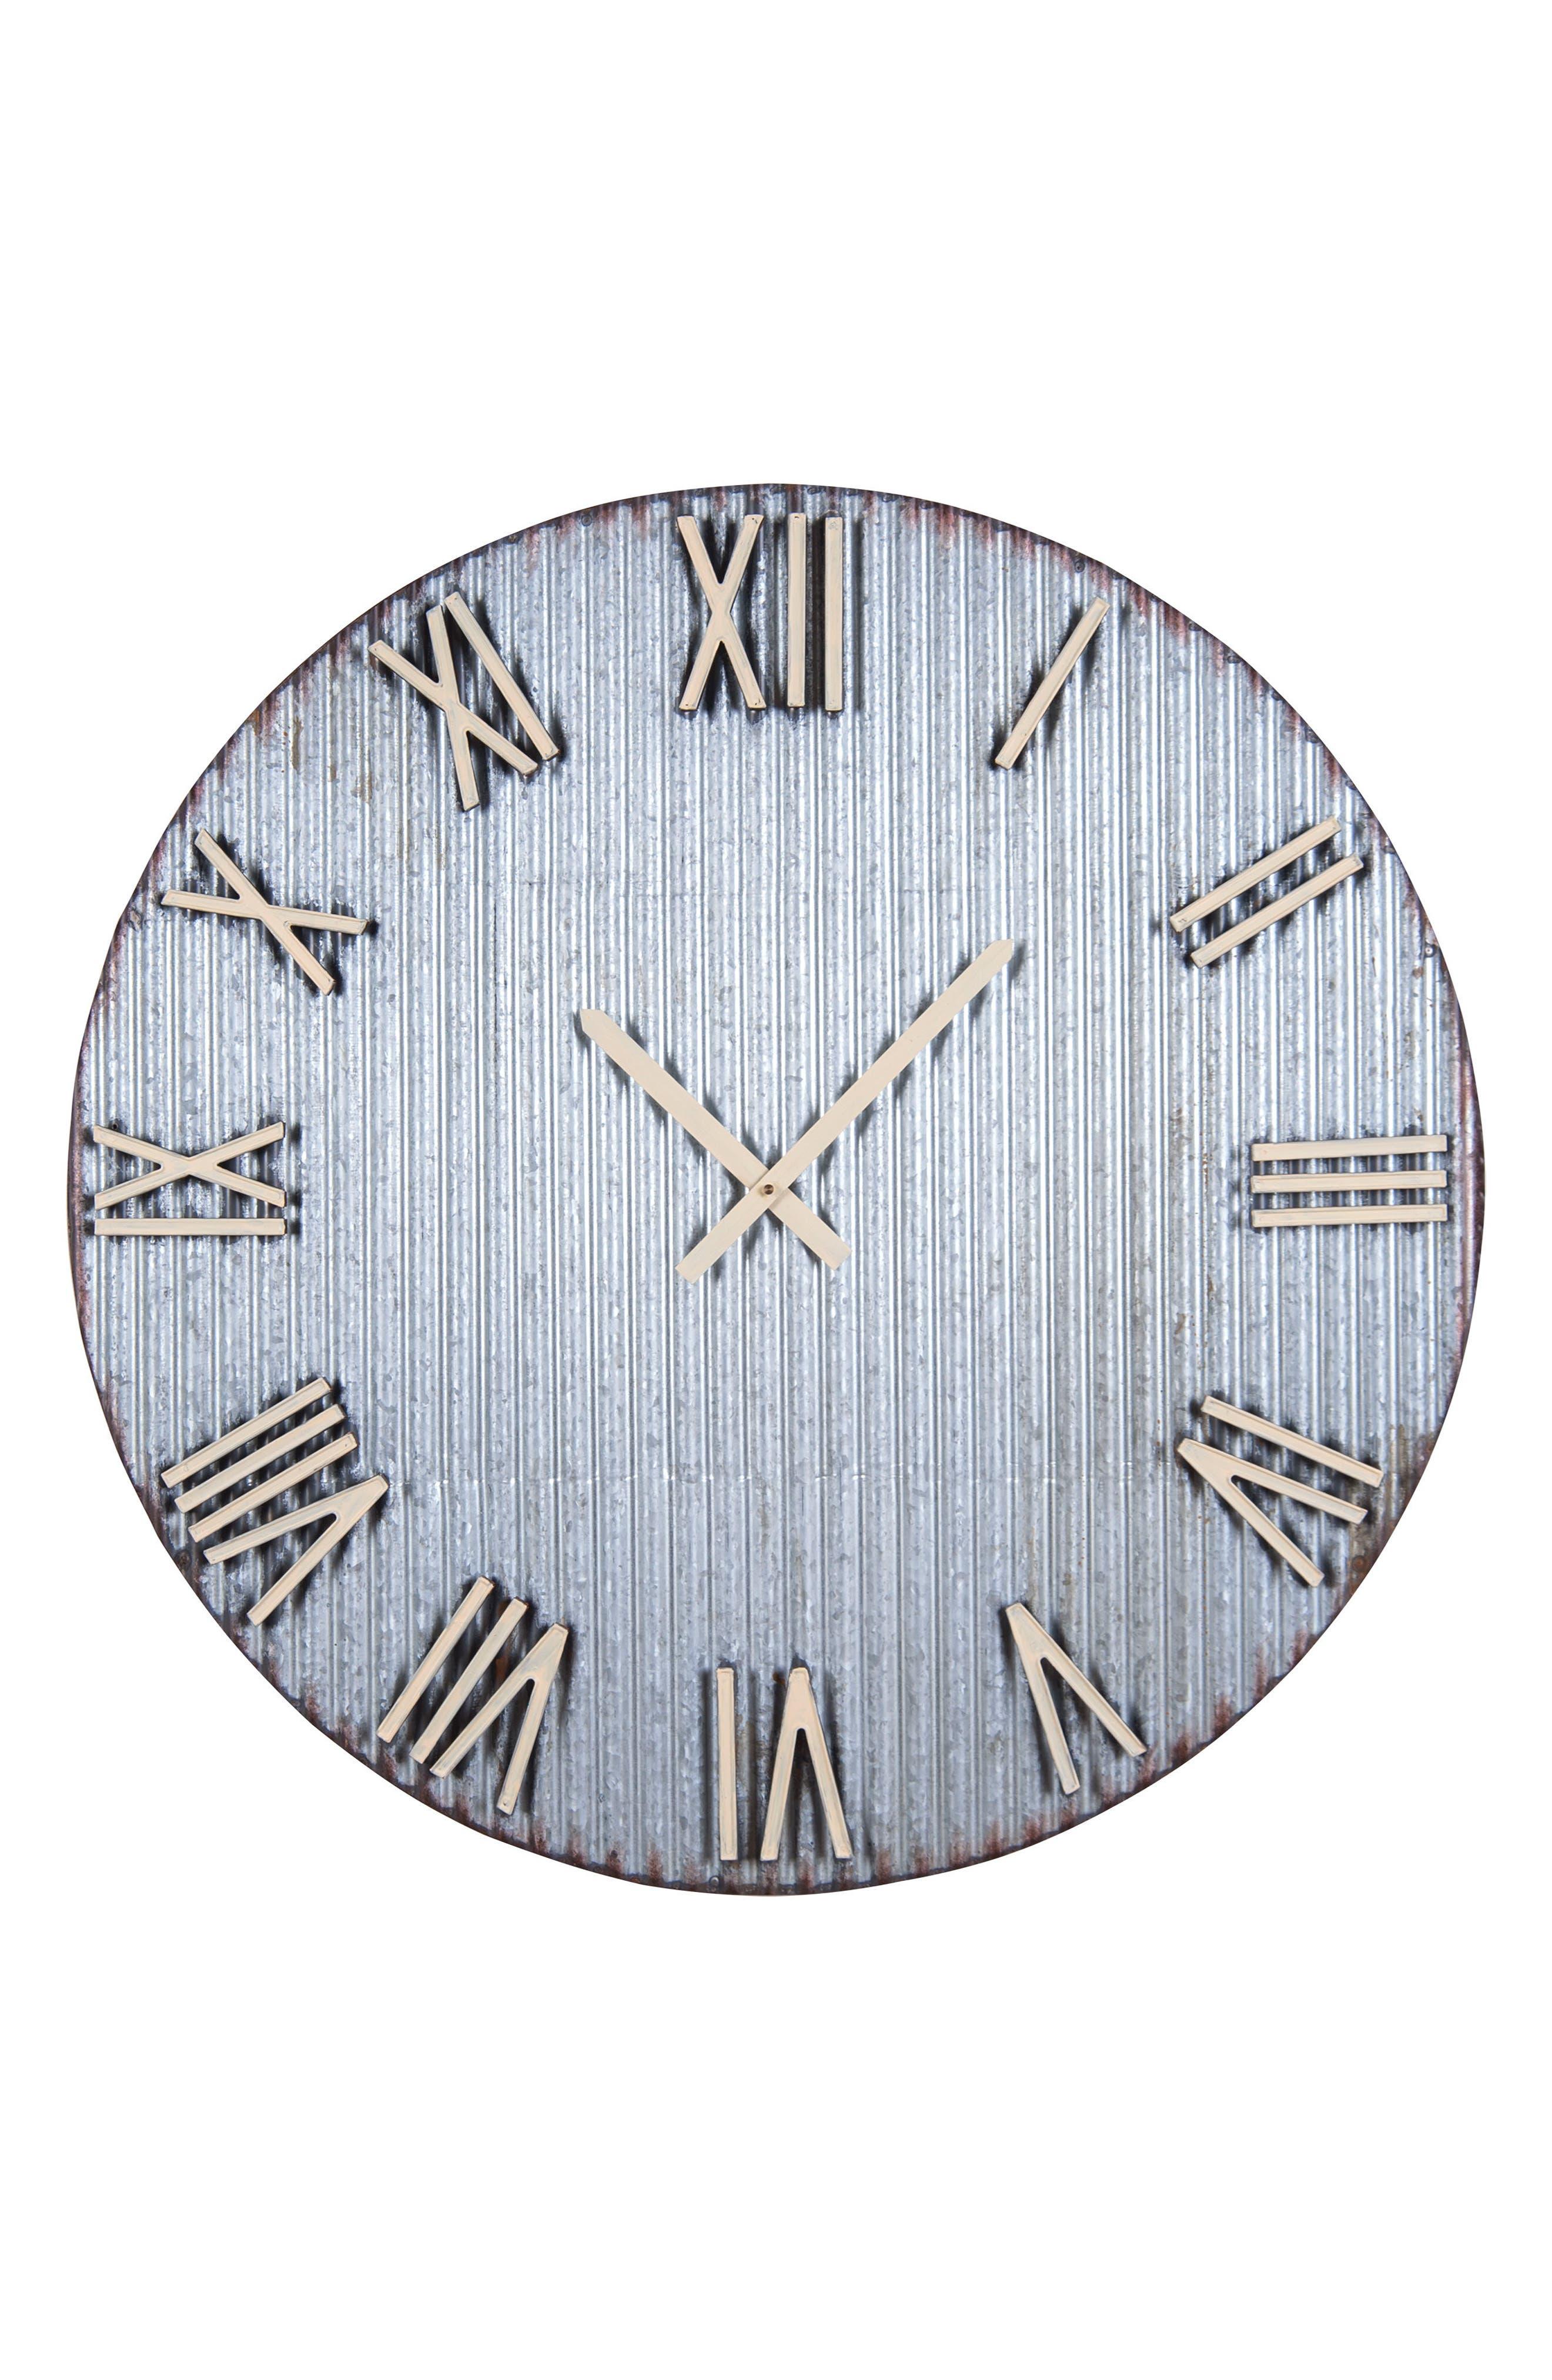 Farmers Corrugated Metal Wall Clock,                             Main thumbnail 1, color,                             Metal